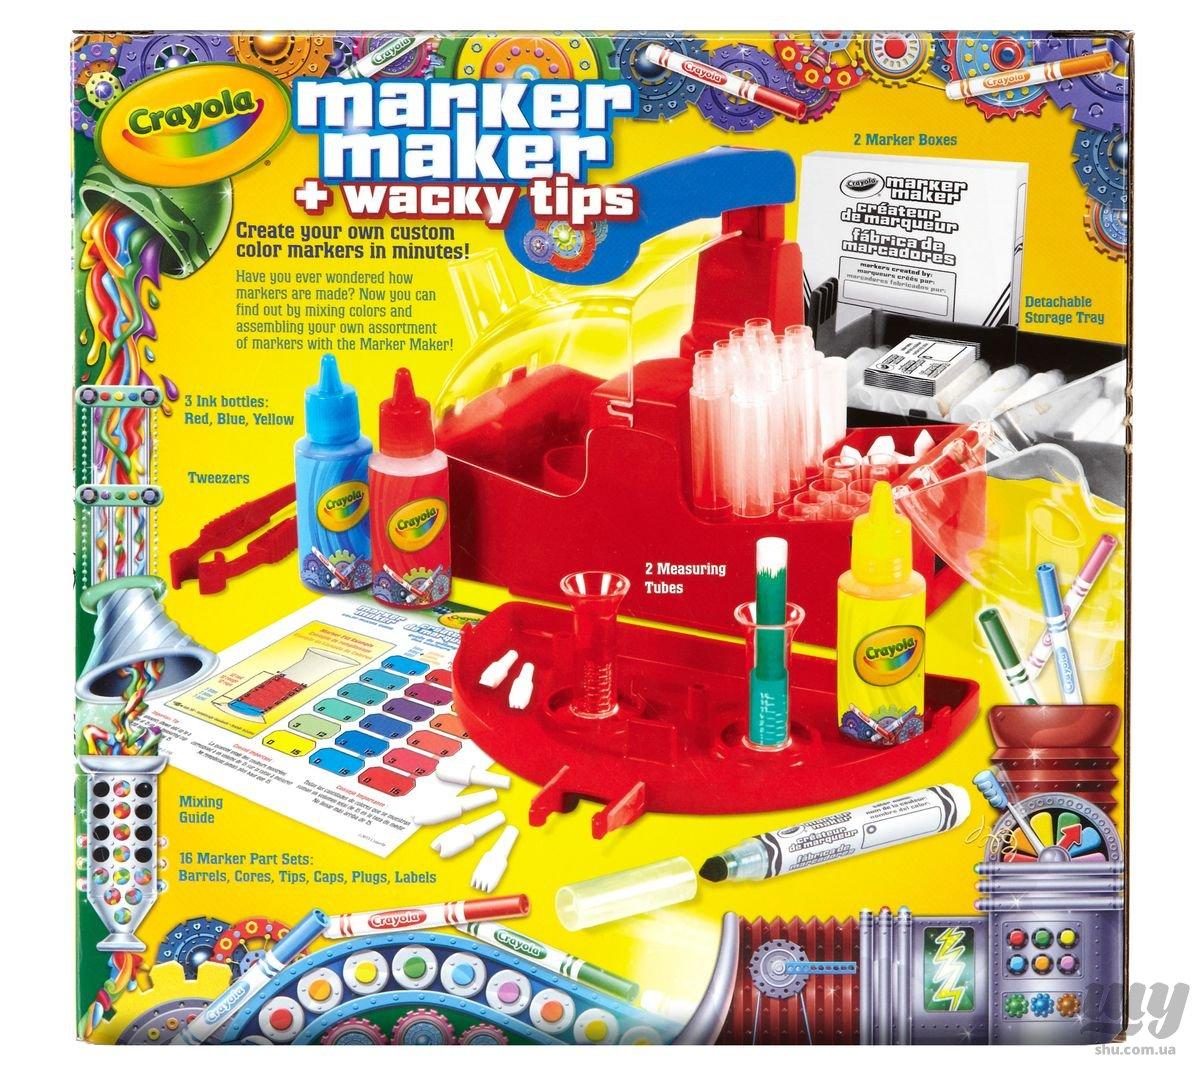 74-7058-0_Product_Toy_Makers_Marker-Maker_Wacky-Tips_B.jpg